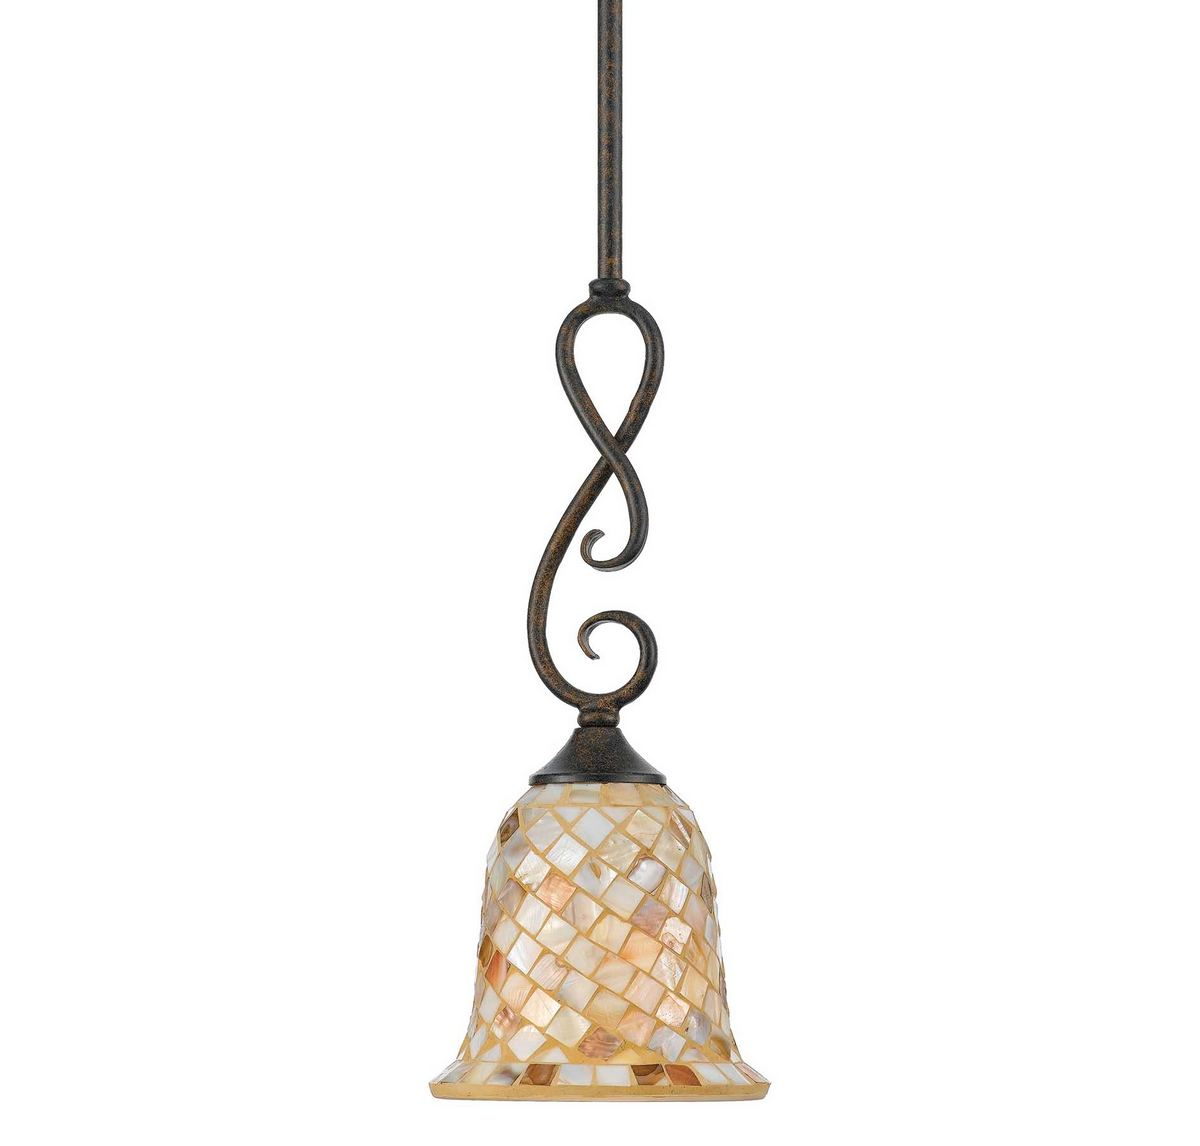 Quoizel Monterey Mosaic Mini Pendant in Natural/organic